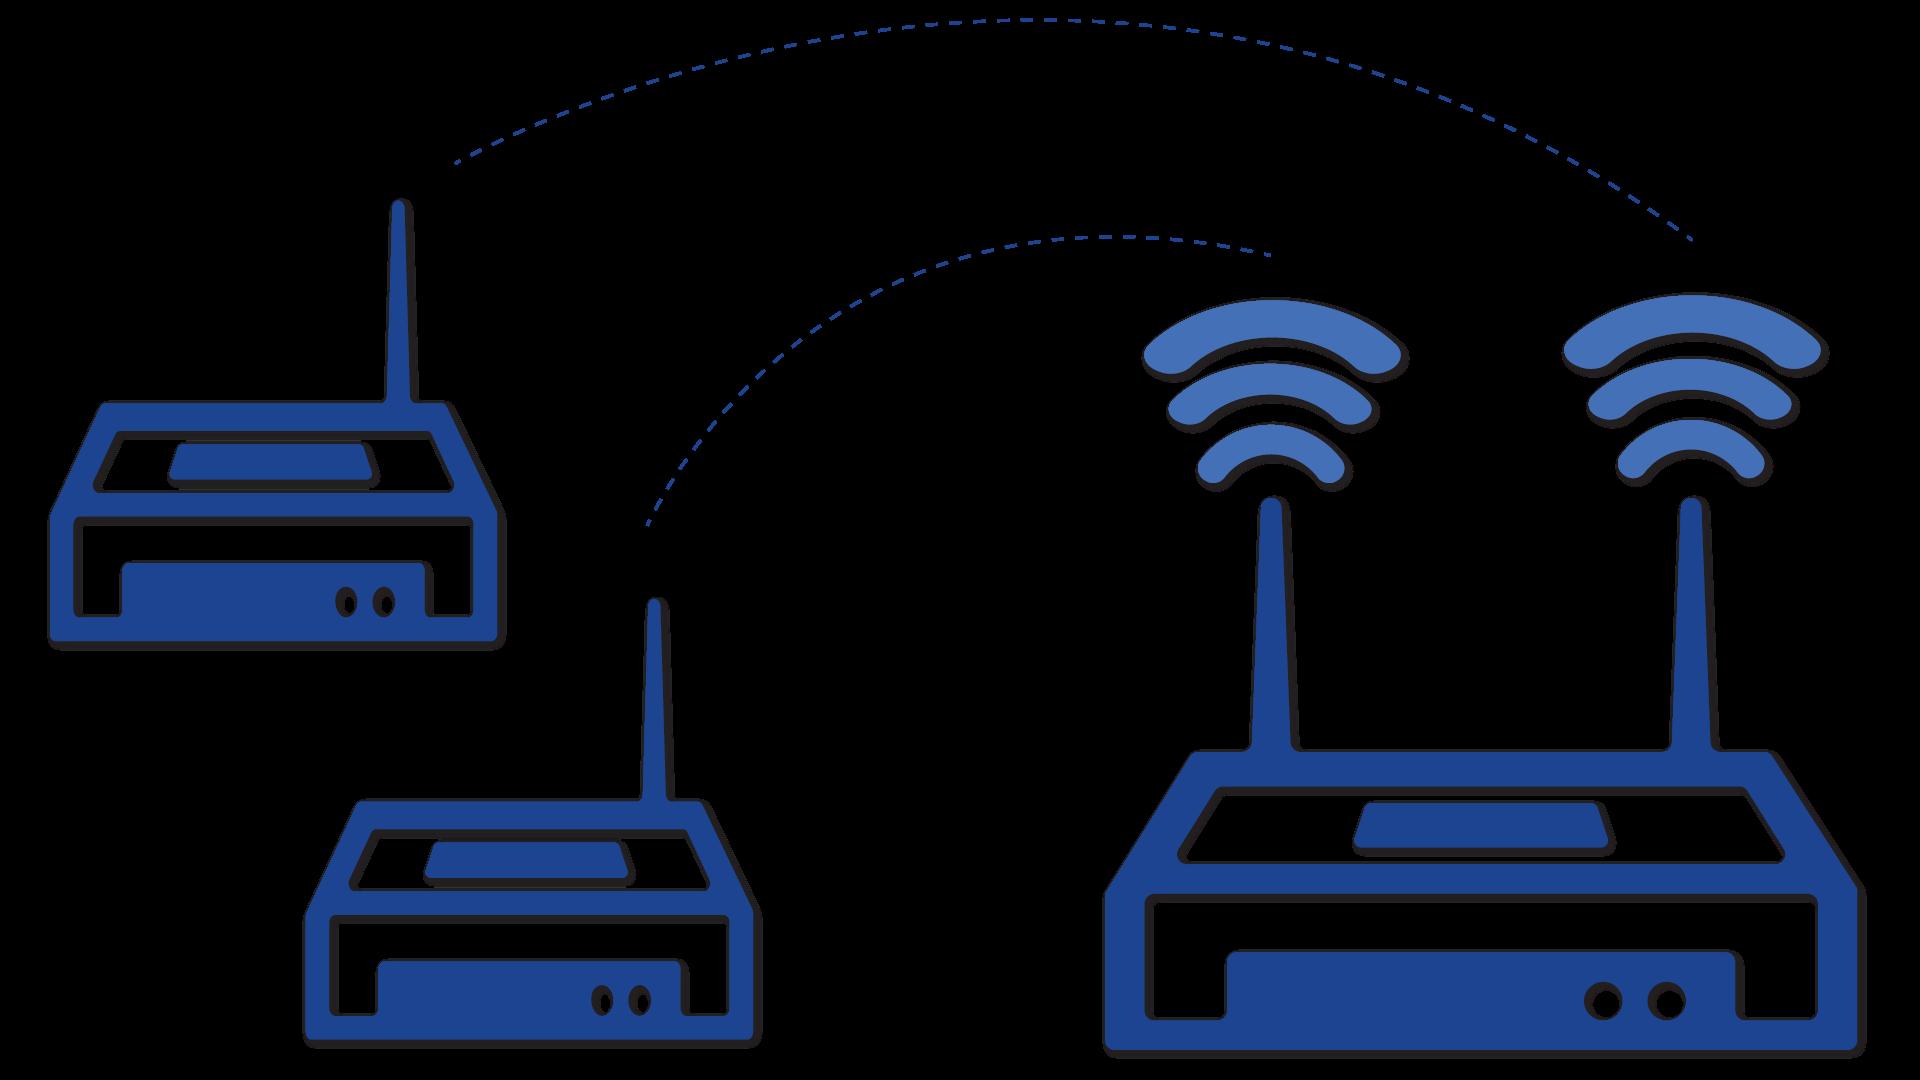 sonicu-network-example